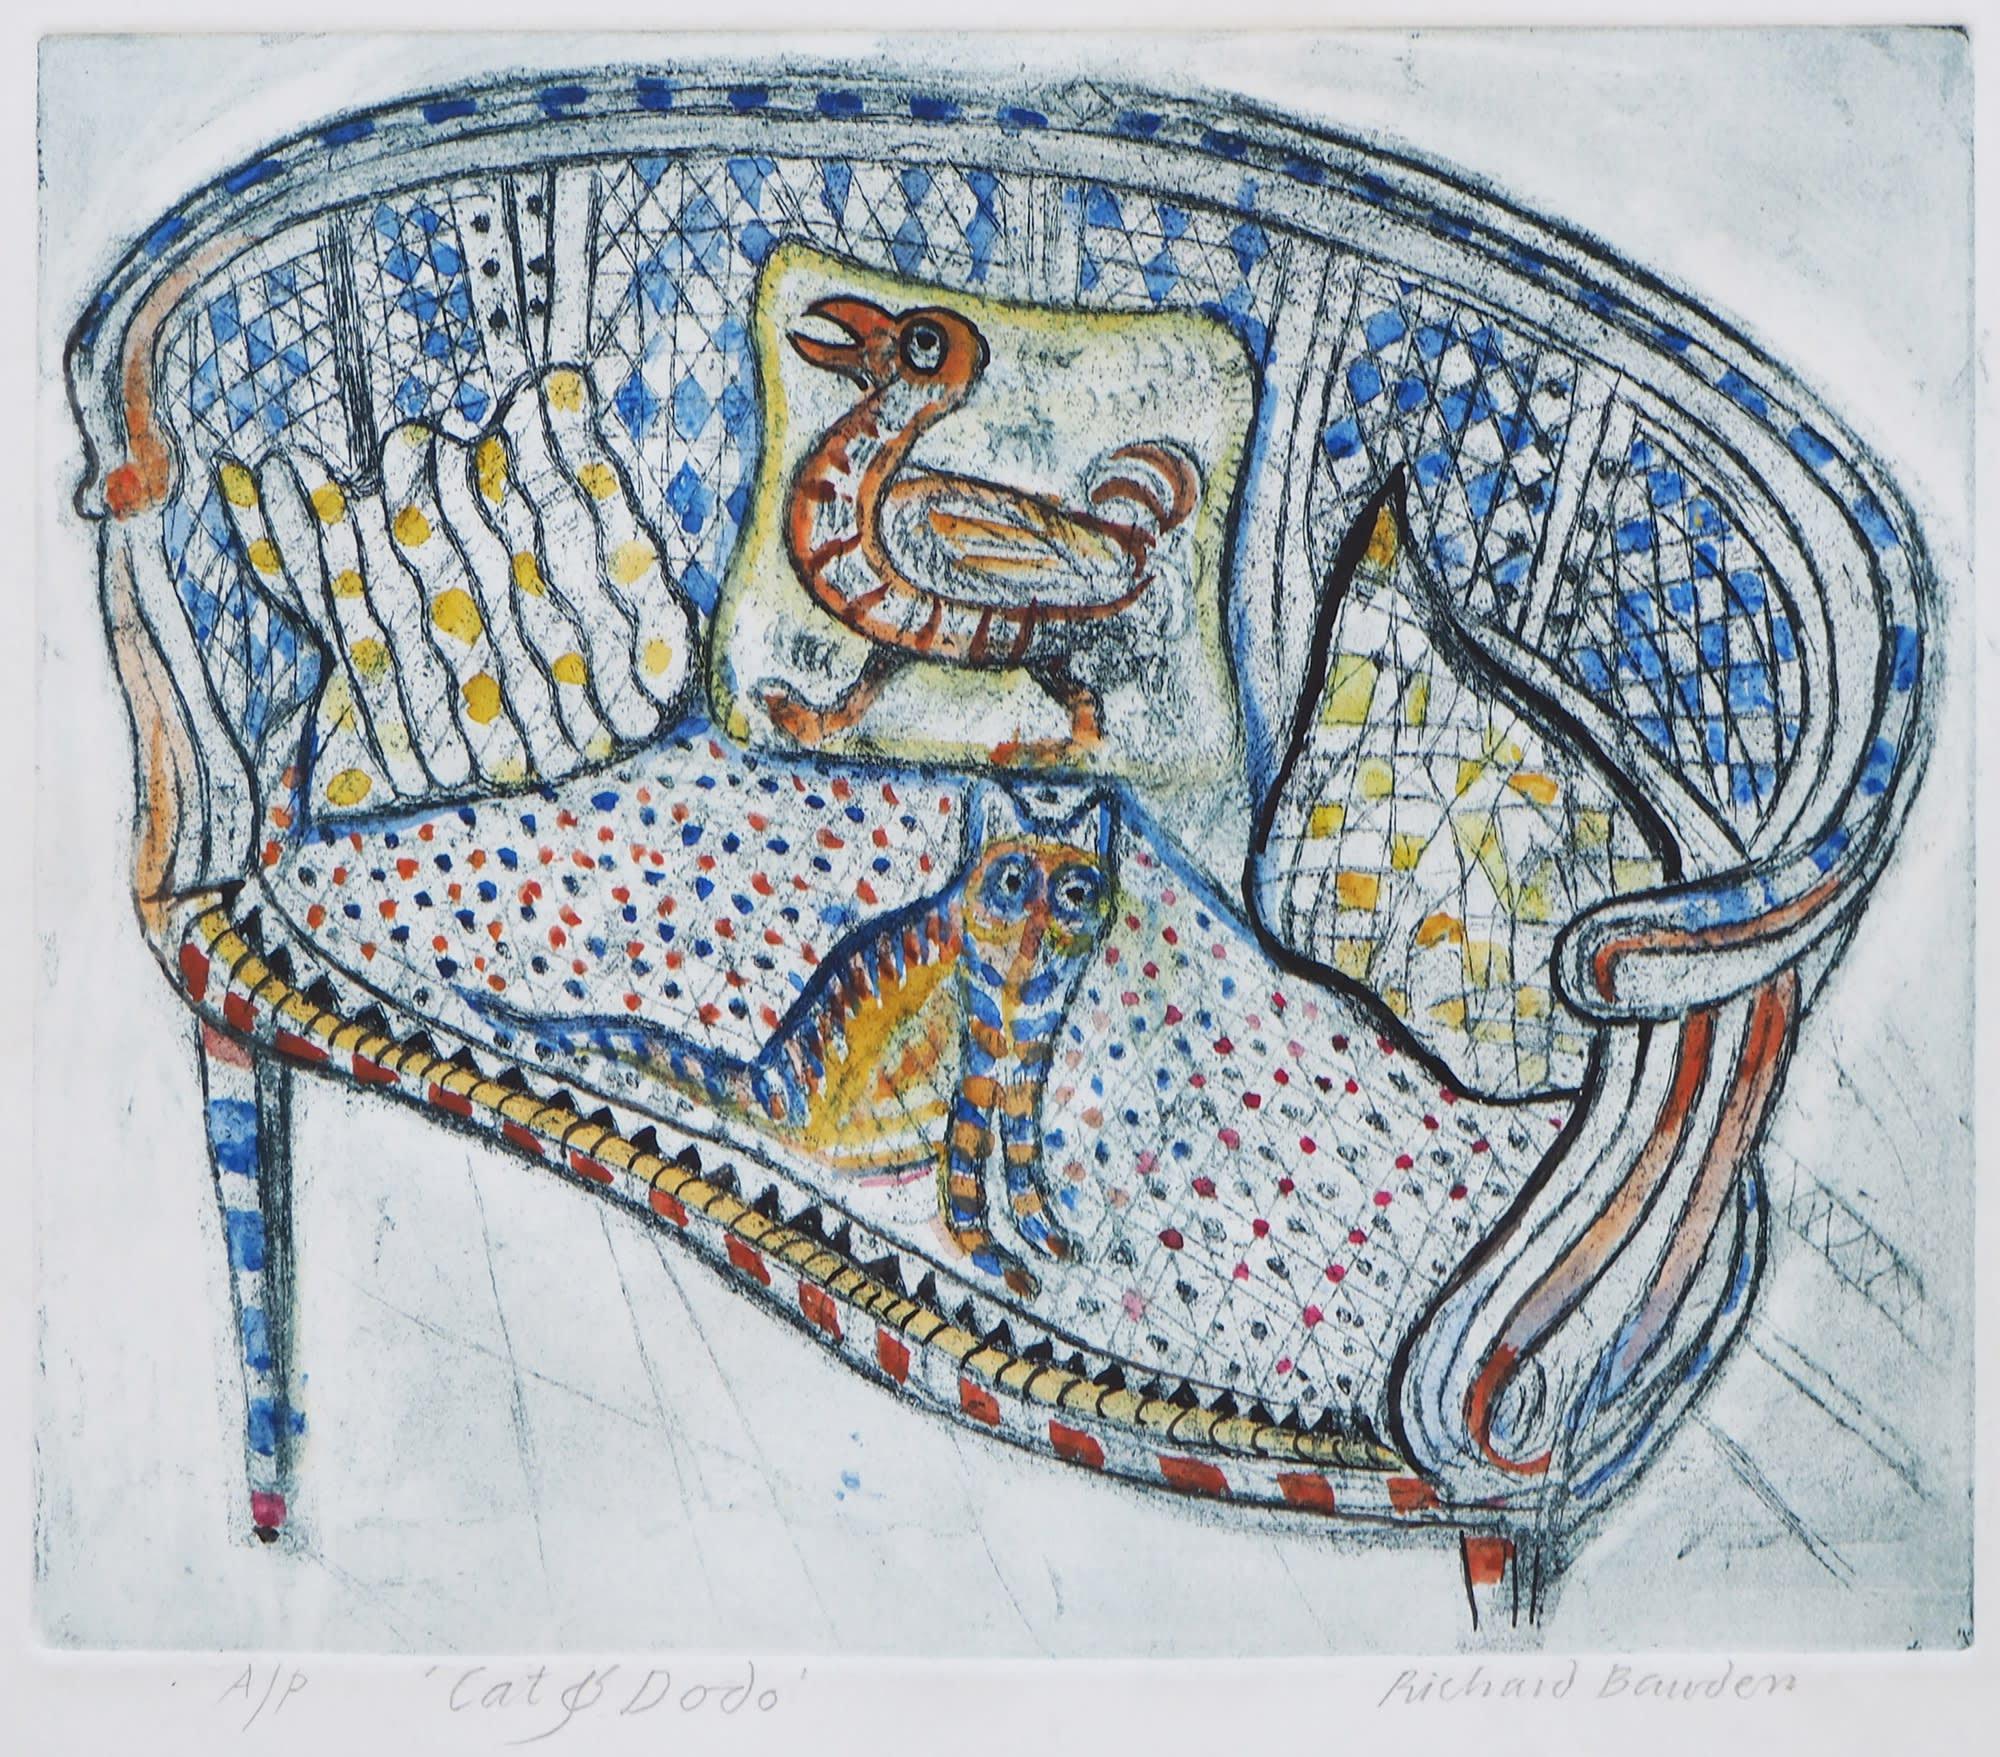 "<span class=""link fancybox-details-link""><a href=""/exhibitions/21/works/artworks_standalone11006/"">View Detail Page</a></span><div class=""artist""><span class=""artist""><strong>Richard Bawden RWS RE</strong></span></div><div class=""title""><em>Cat & Dodo</em></div><div class=""medium"">hand coloured etching</div><div class=""dimensions"">43 x 45 cm framed<br>22 x 26 cm image size</div><div class=""edition_details"">Artists proof. Edition of 85</div>"